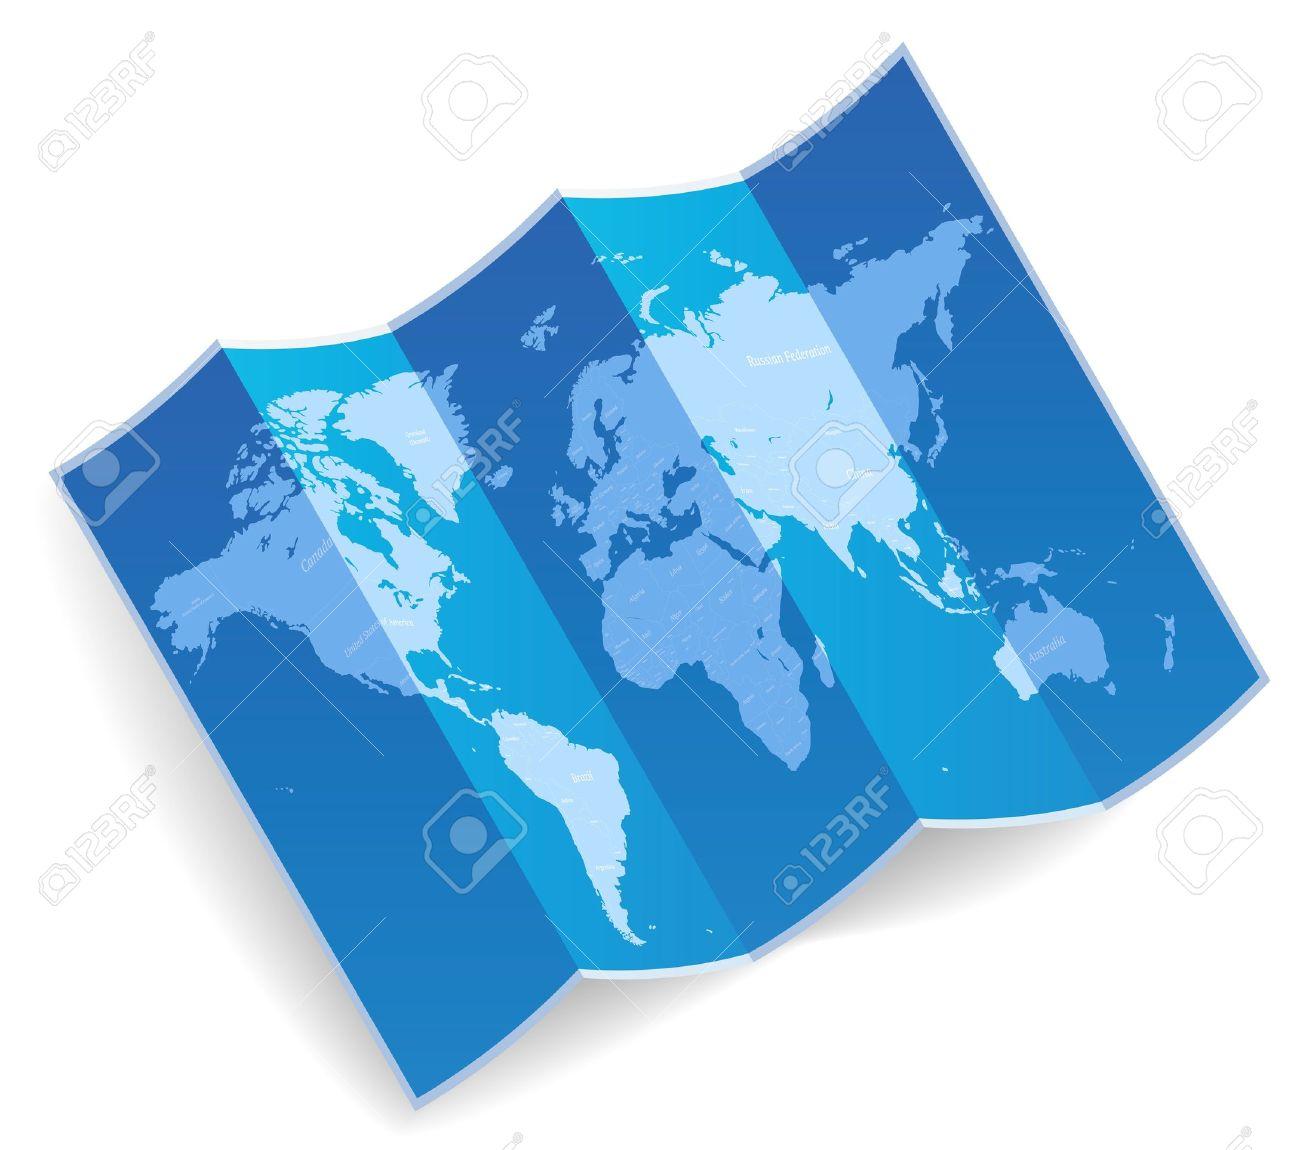 Blue folded world map Vector illustration - 15304640